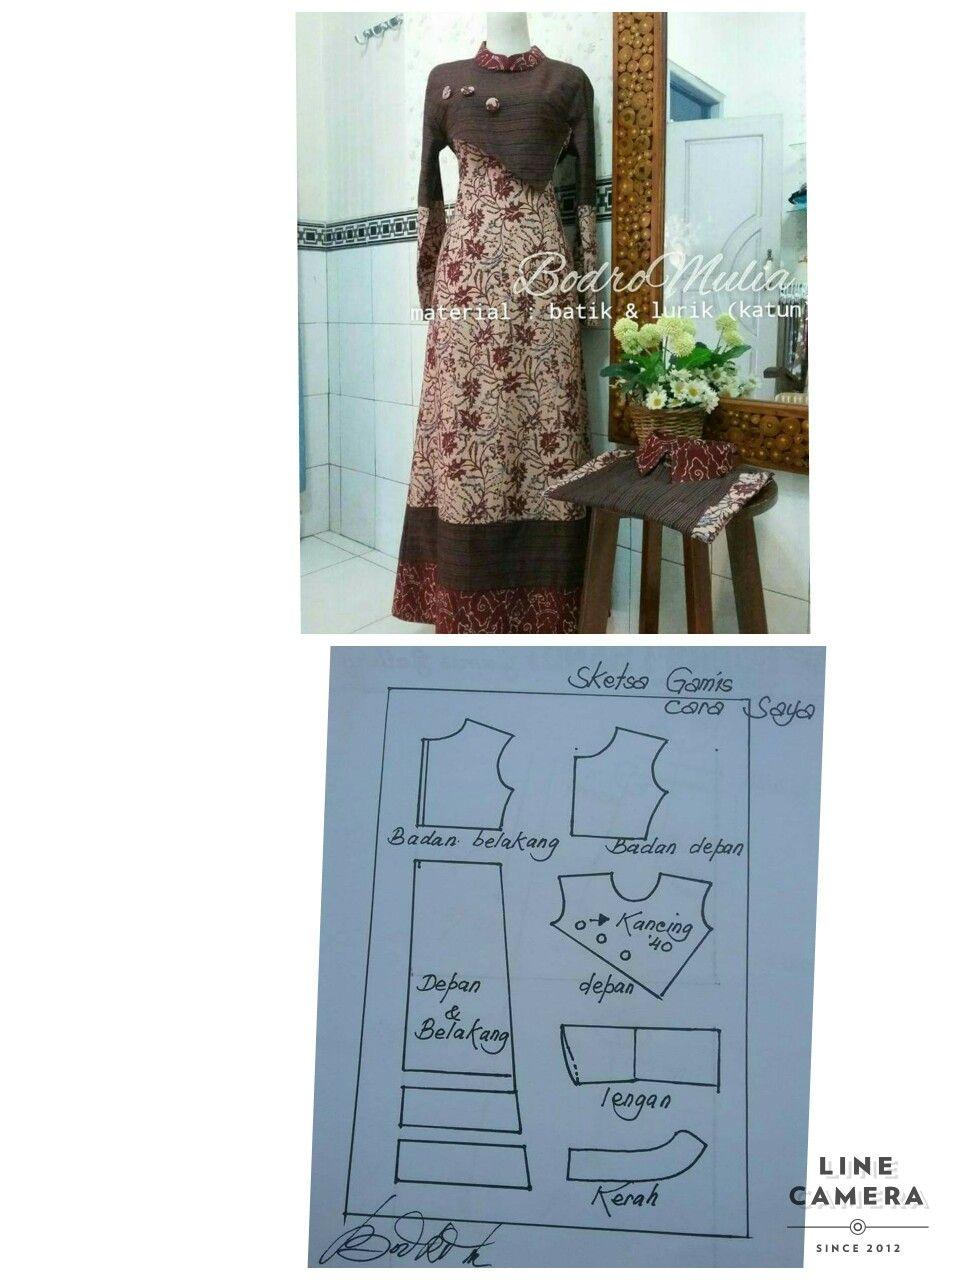 Pin oleh Lis Cantik di Sewing patterns  Pola jahitan, Pola gaun